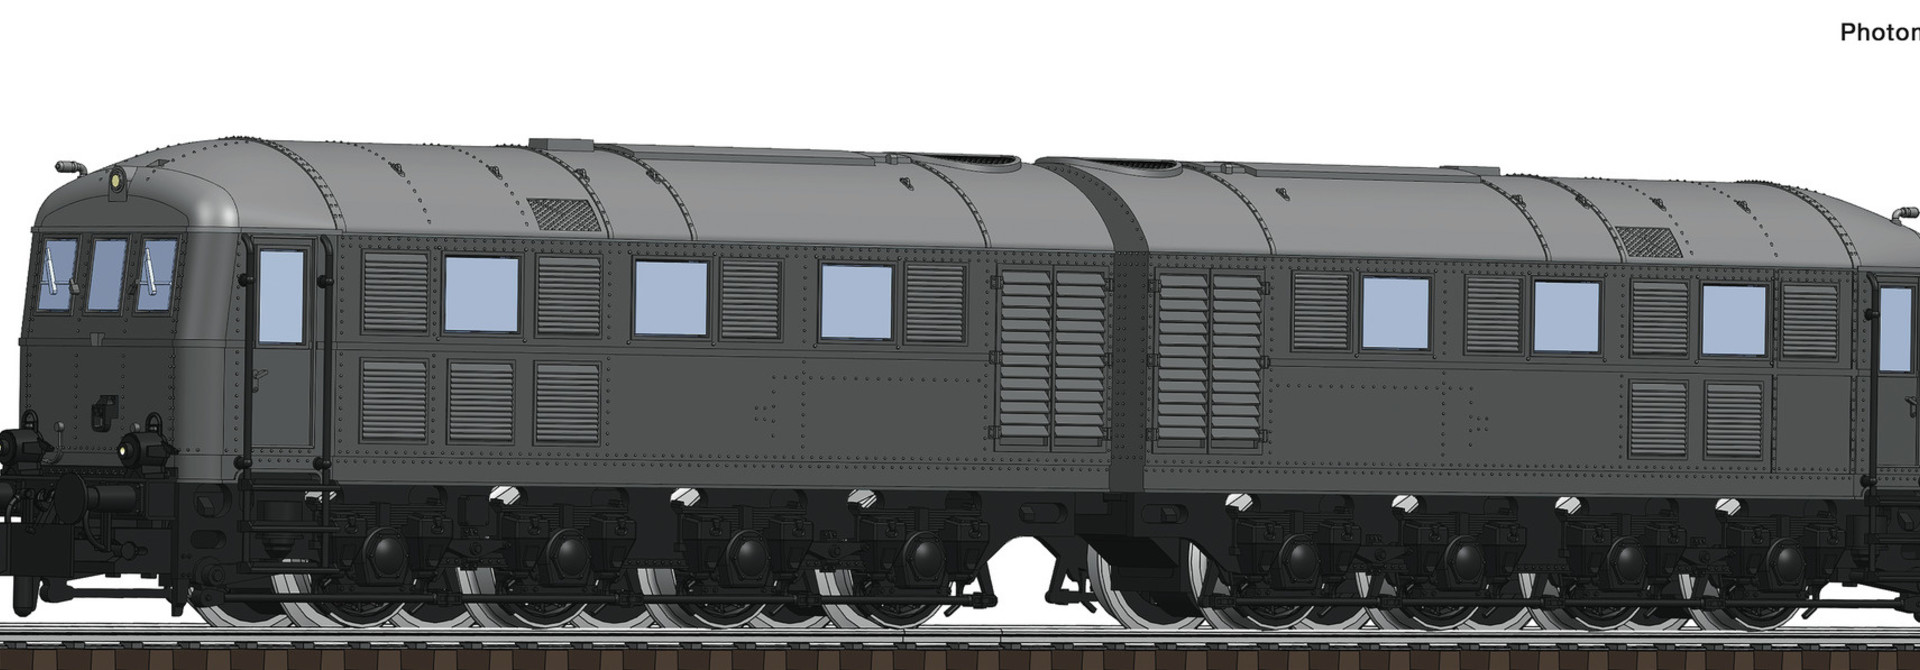 725101 Doppel-Diesellok V188 grau